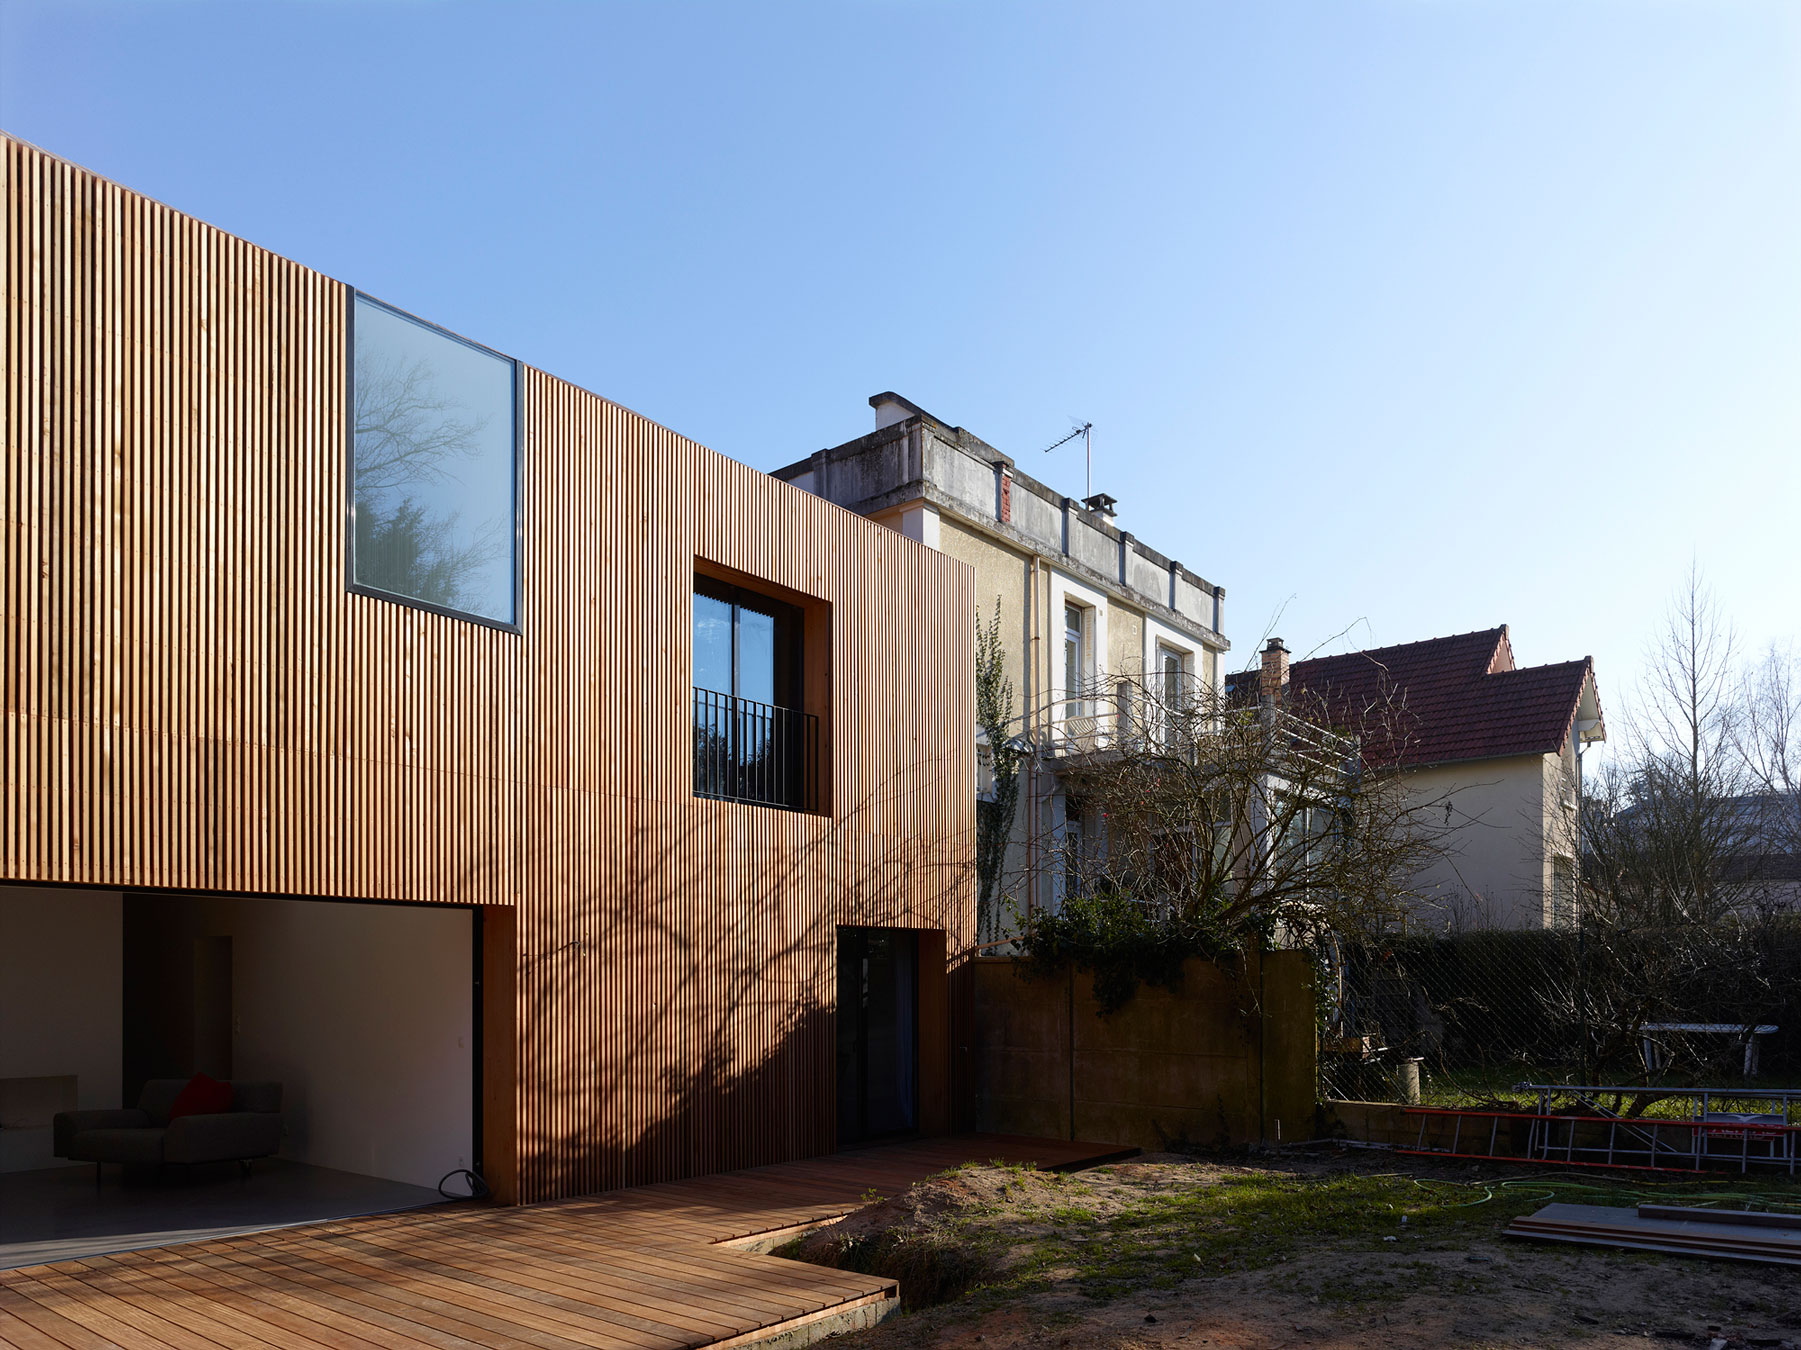 Maison 2G by Avenier Cornejo Architectes (6)